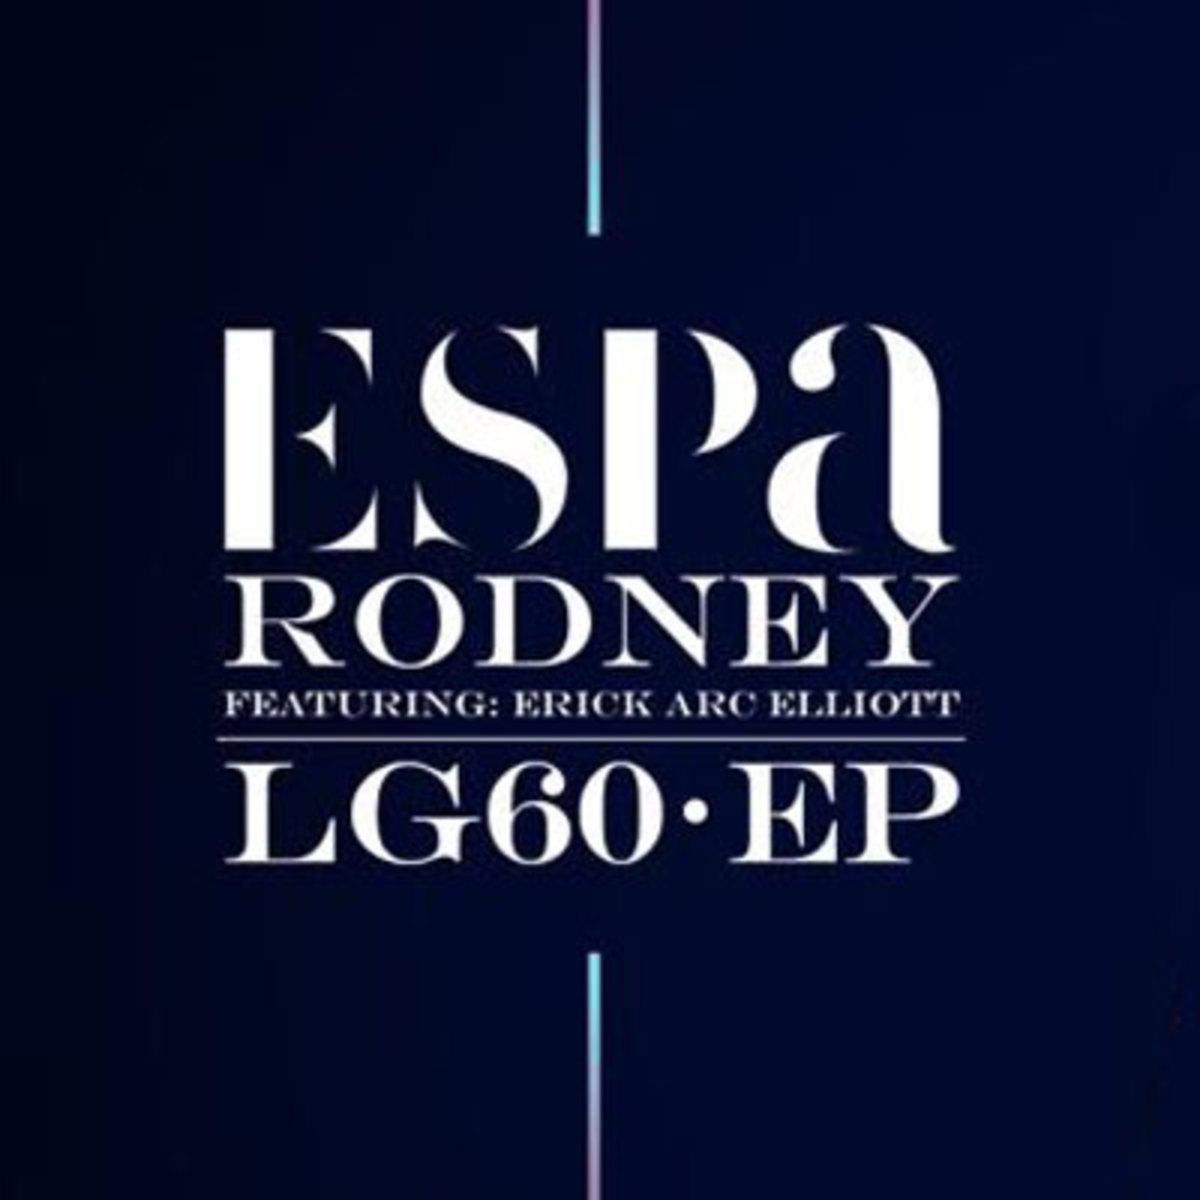 espa-rodney.jpg